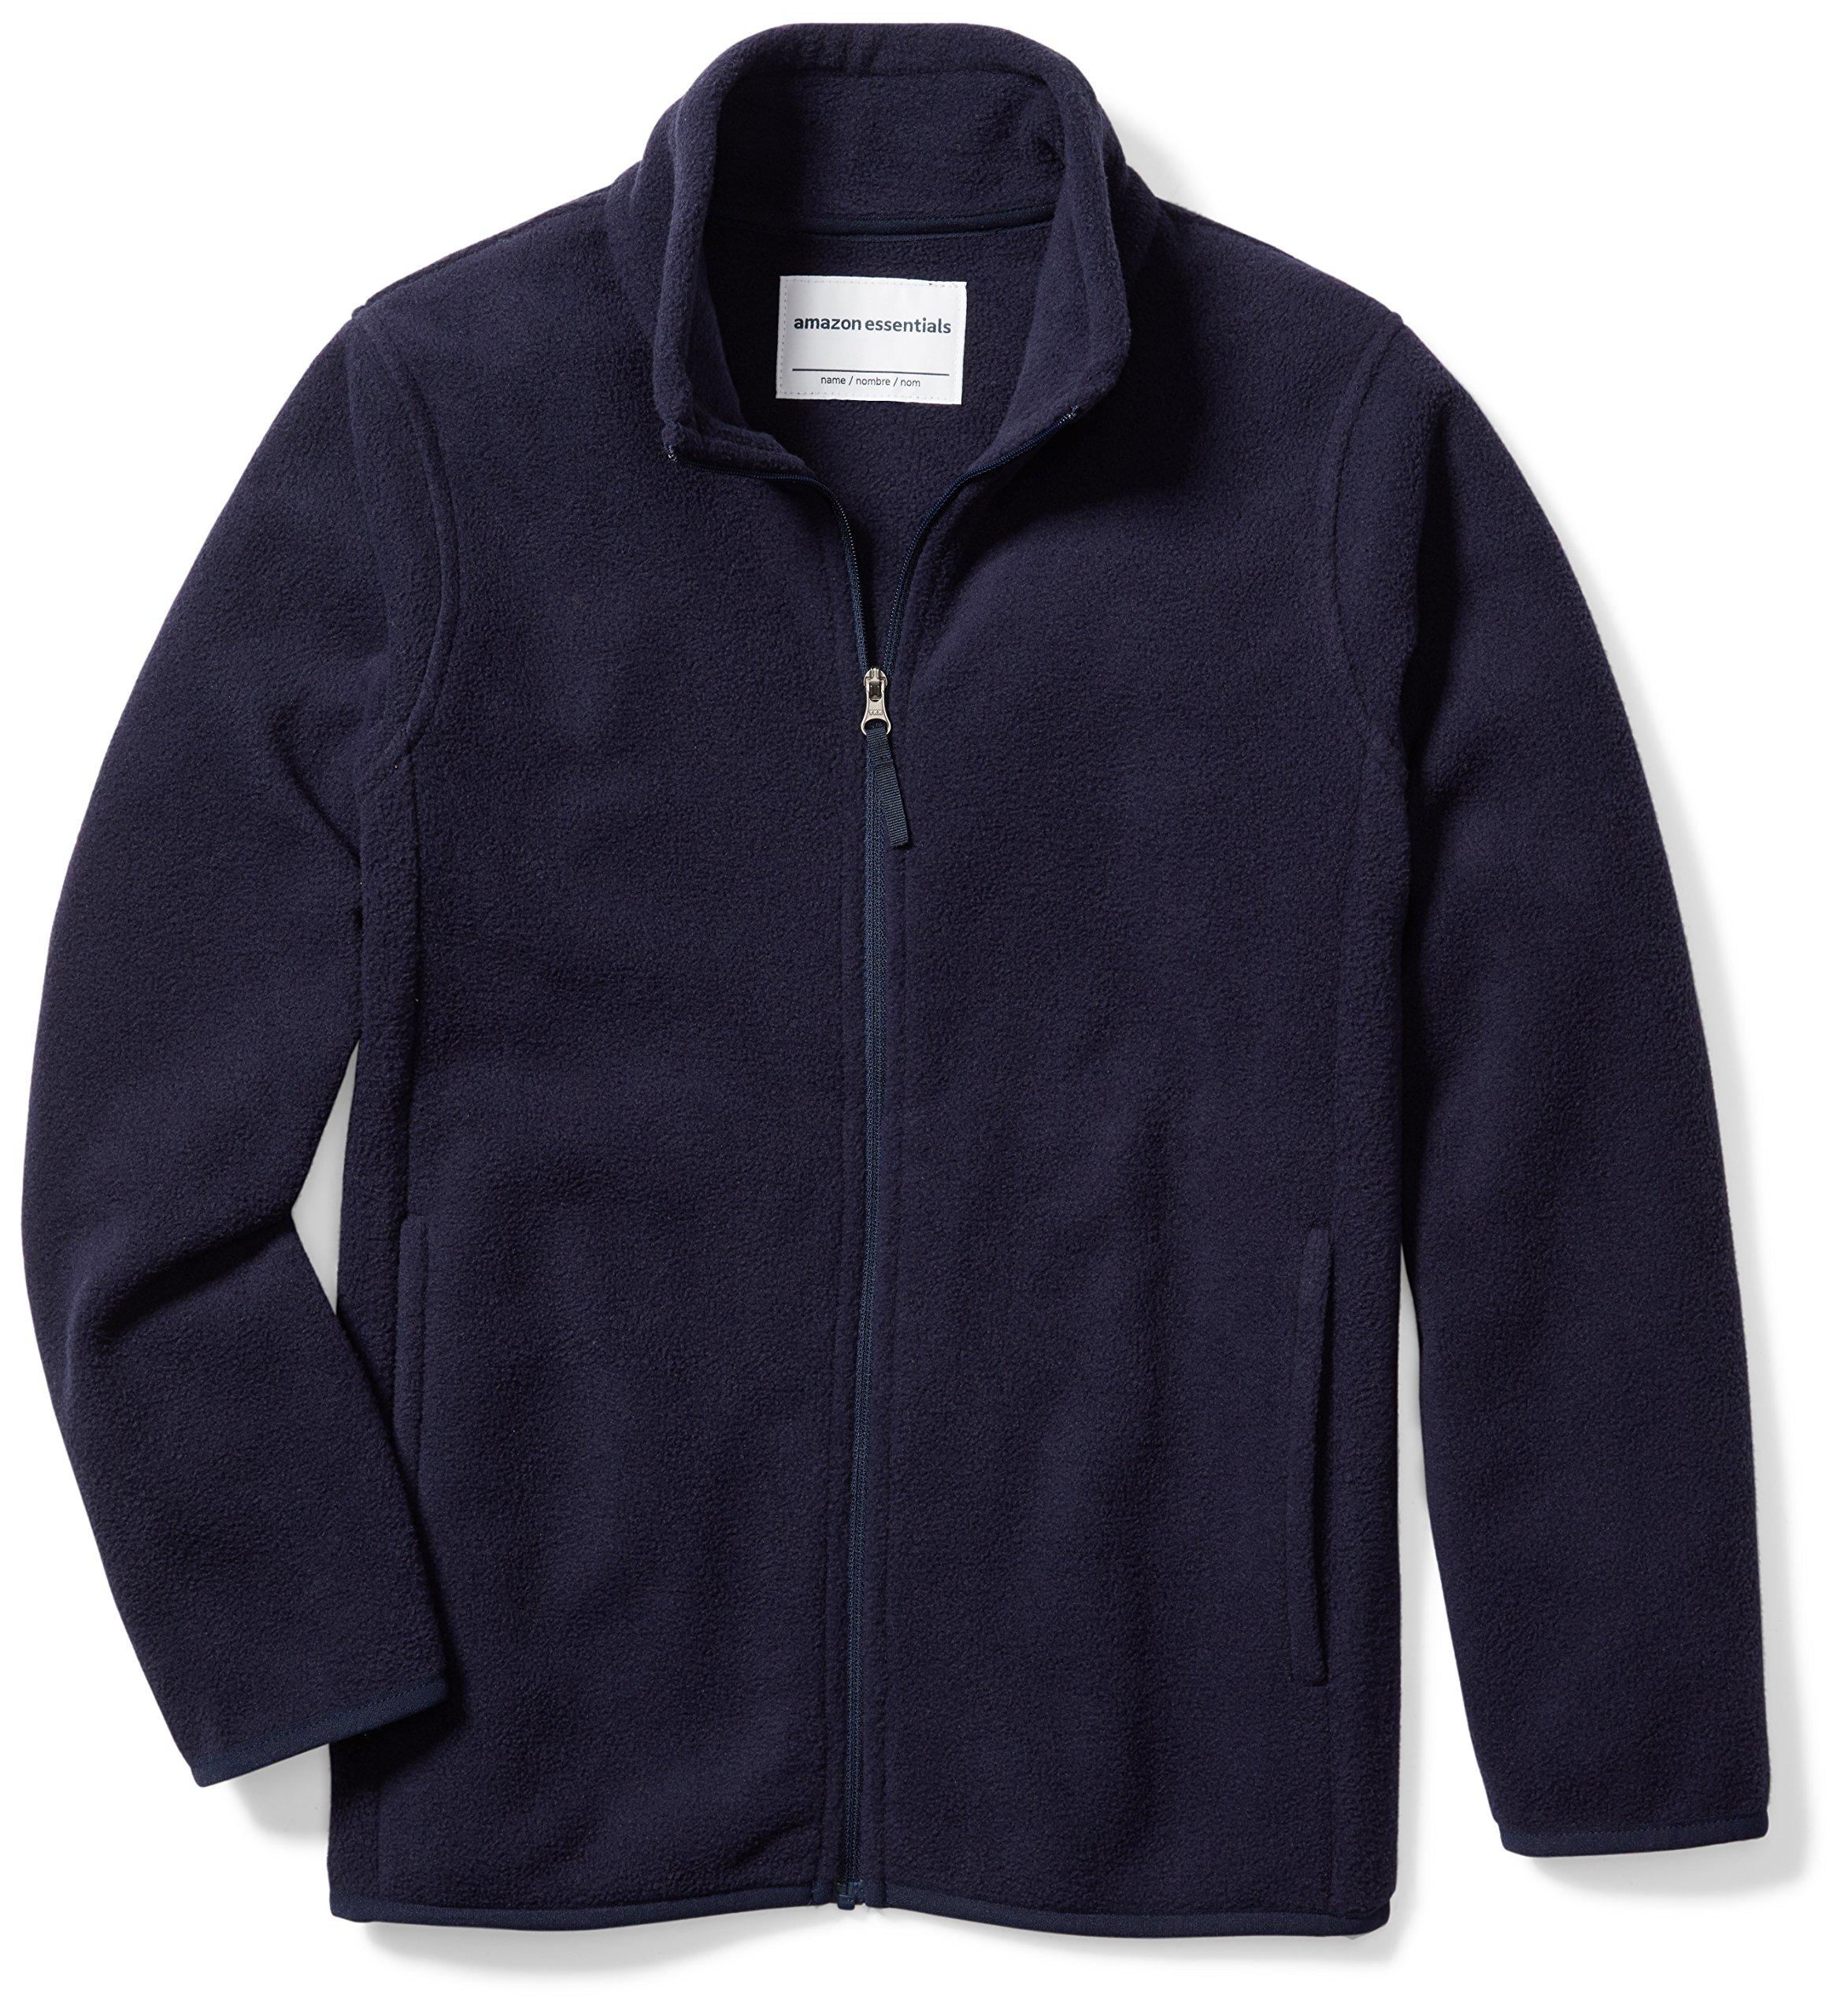 Amazon Essentials Boys' Full-Zip Polar Fleece Jacket, Night Navy, Medium by Amazon Essentials